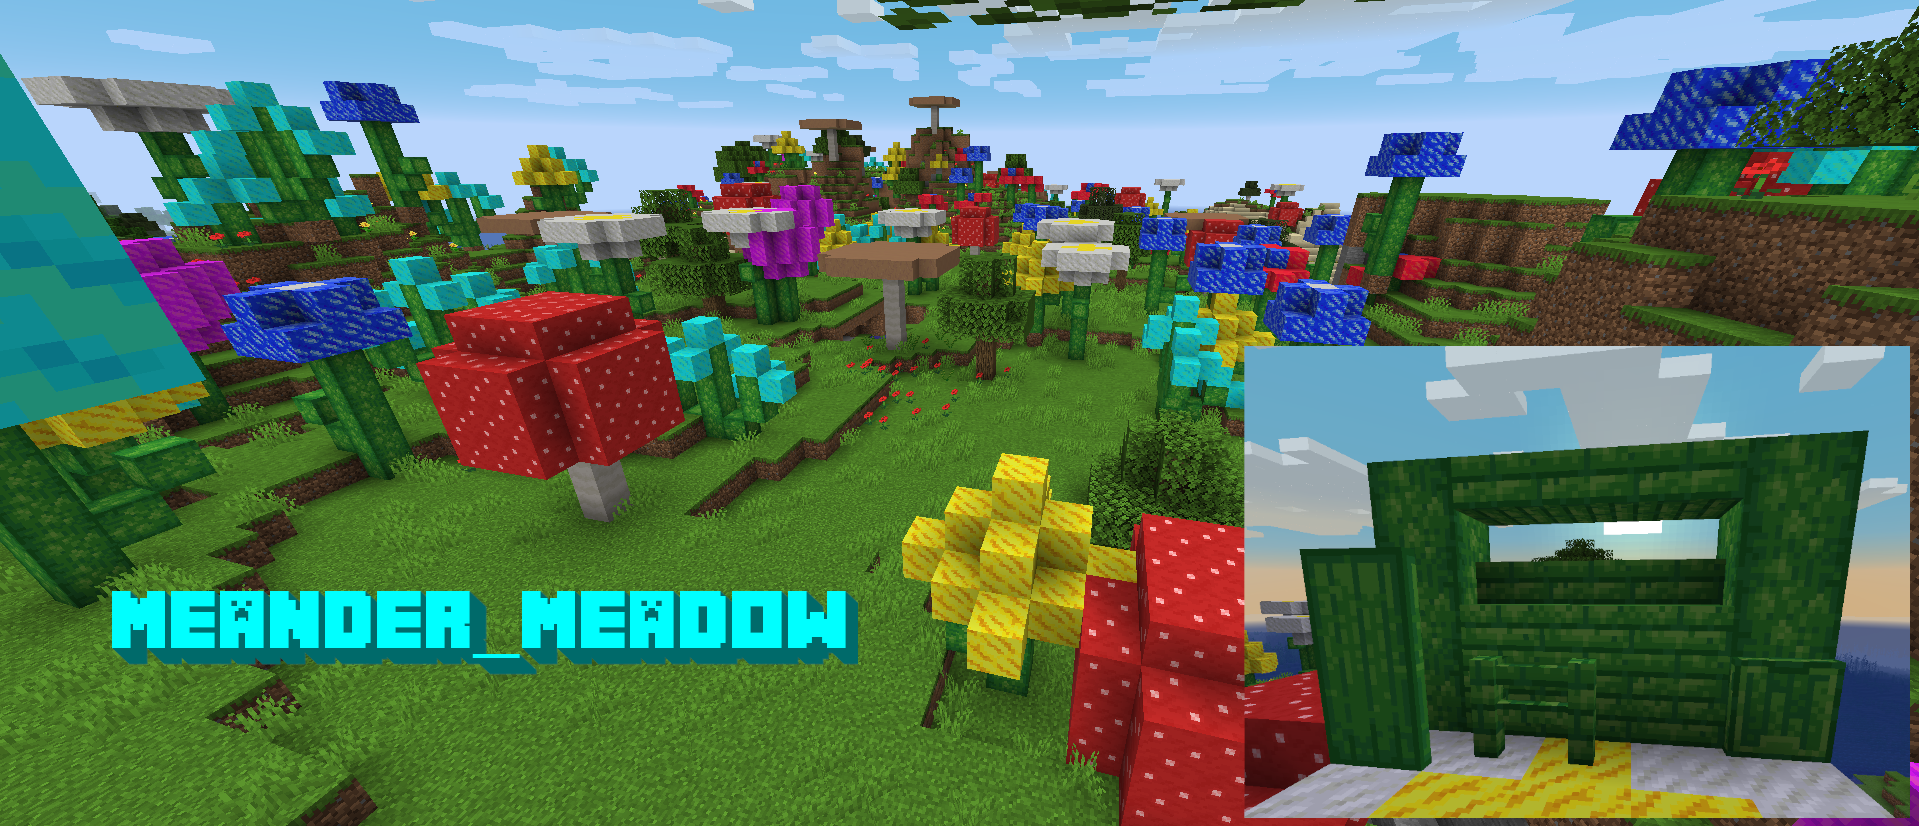 meander meadow